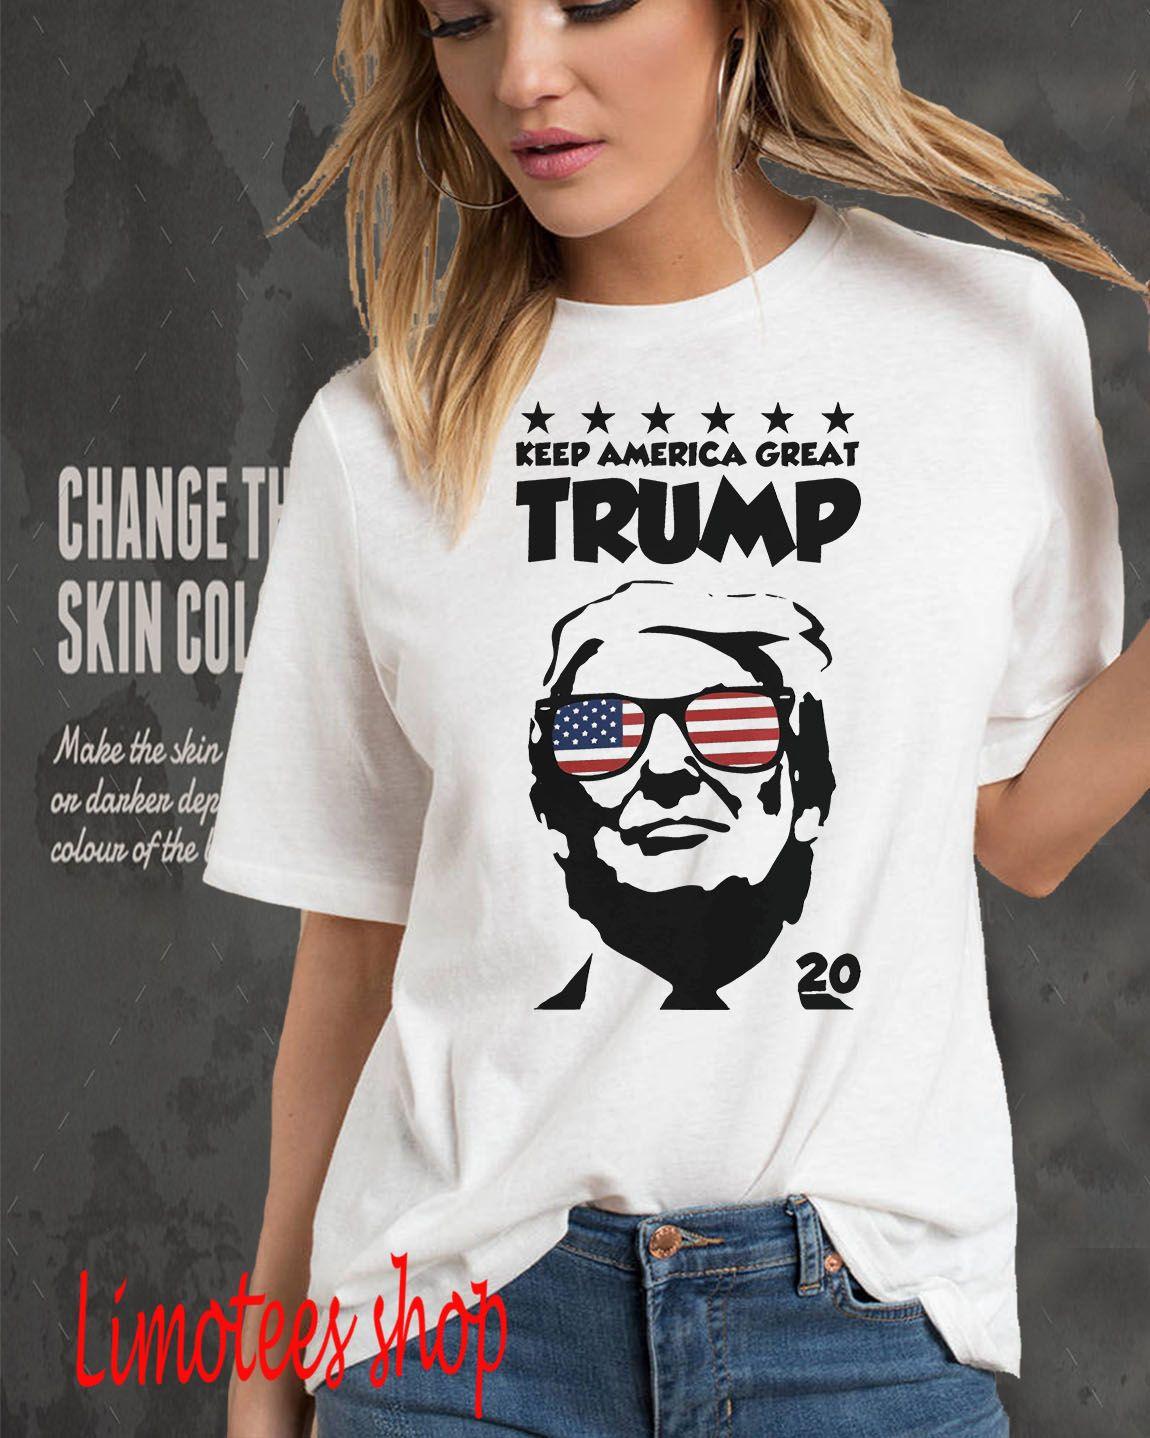 Keep America Great Trump 2020 Shirt, Youth tee, V neck